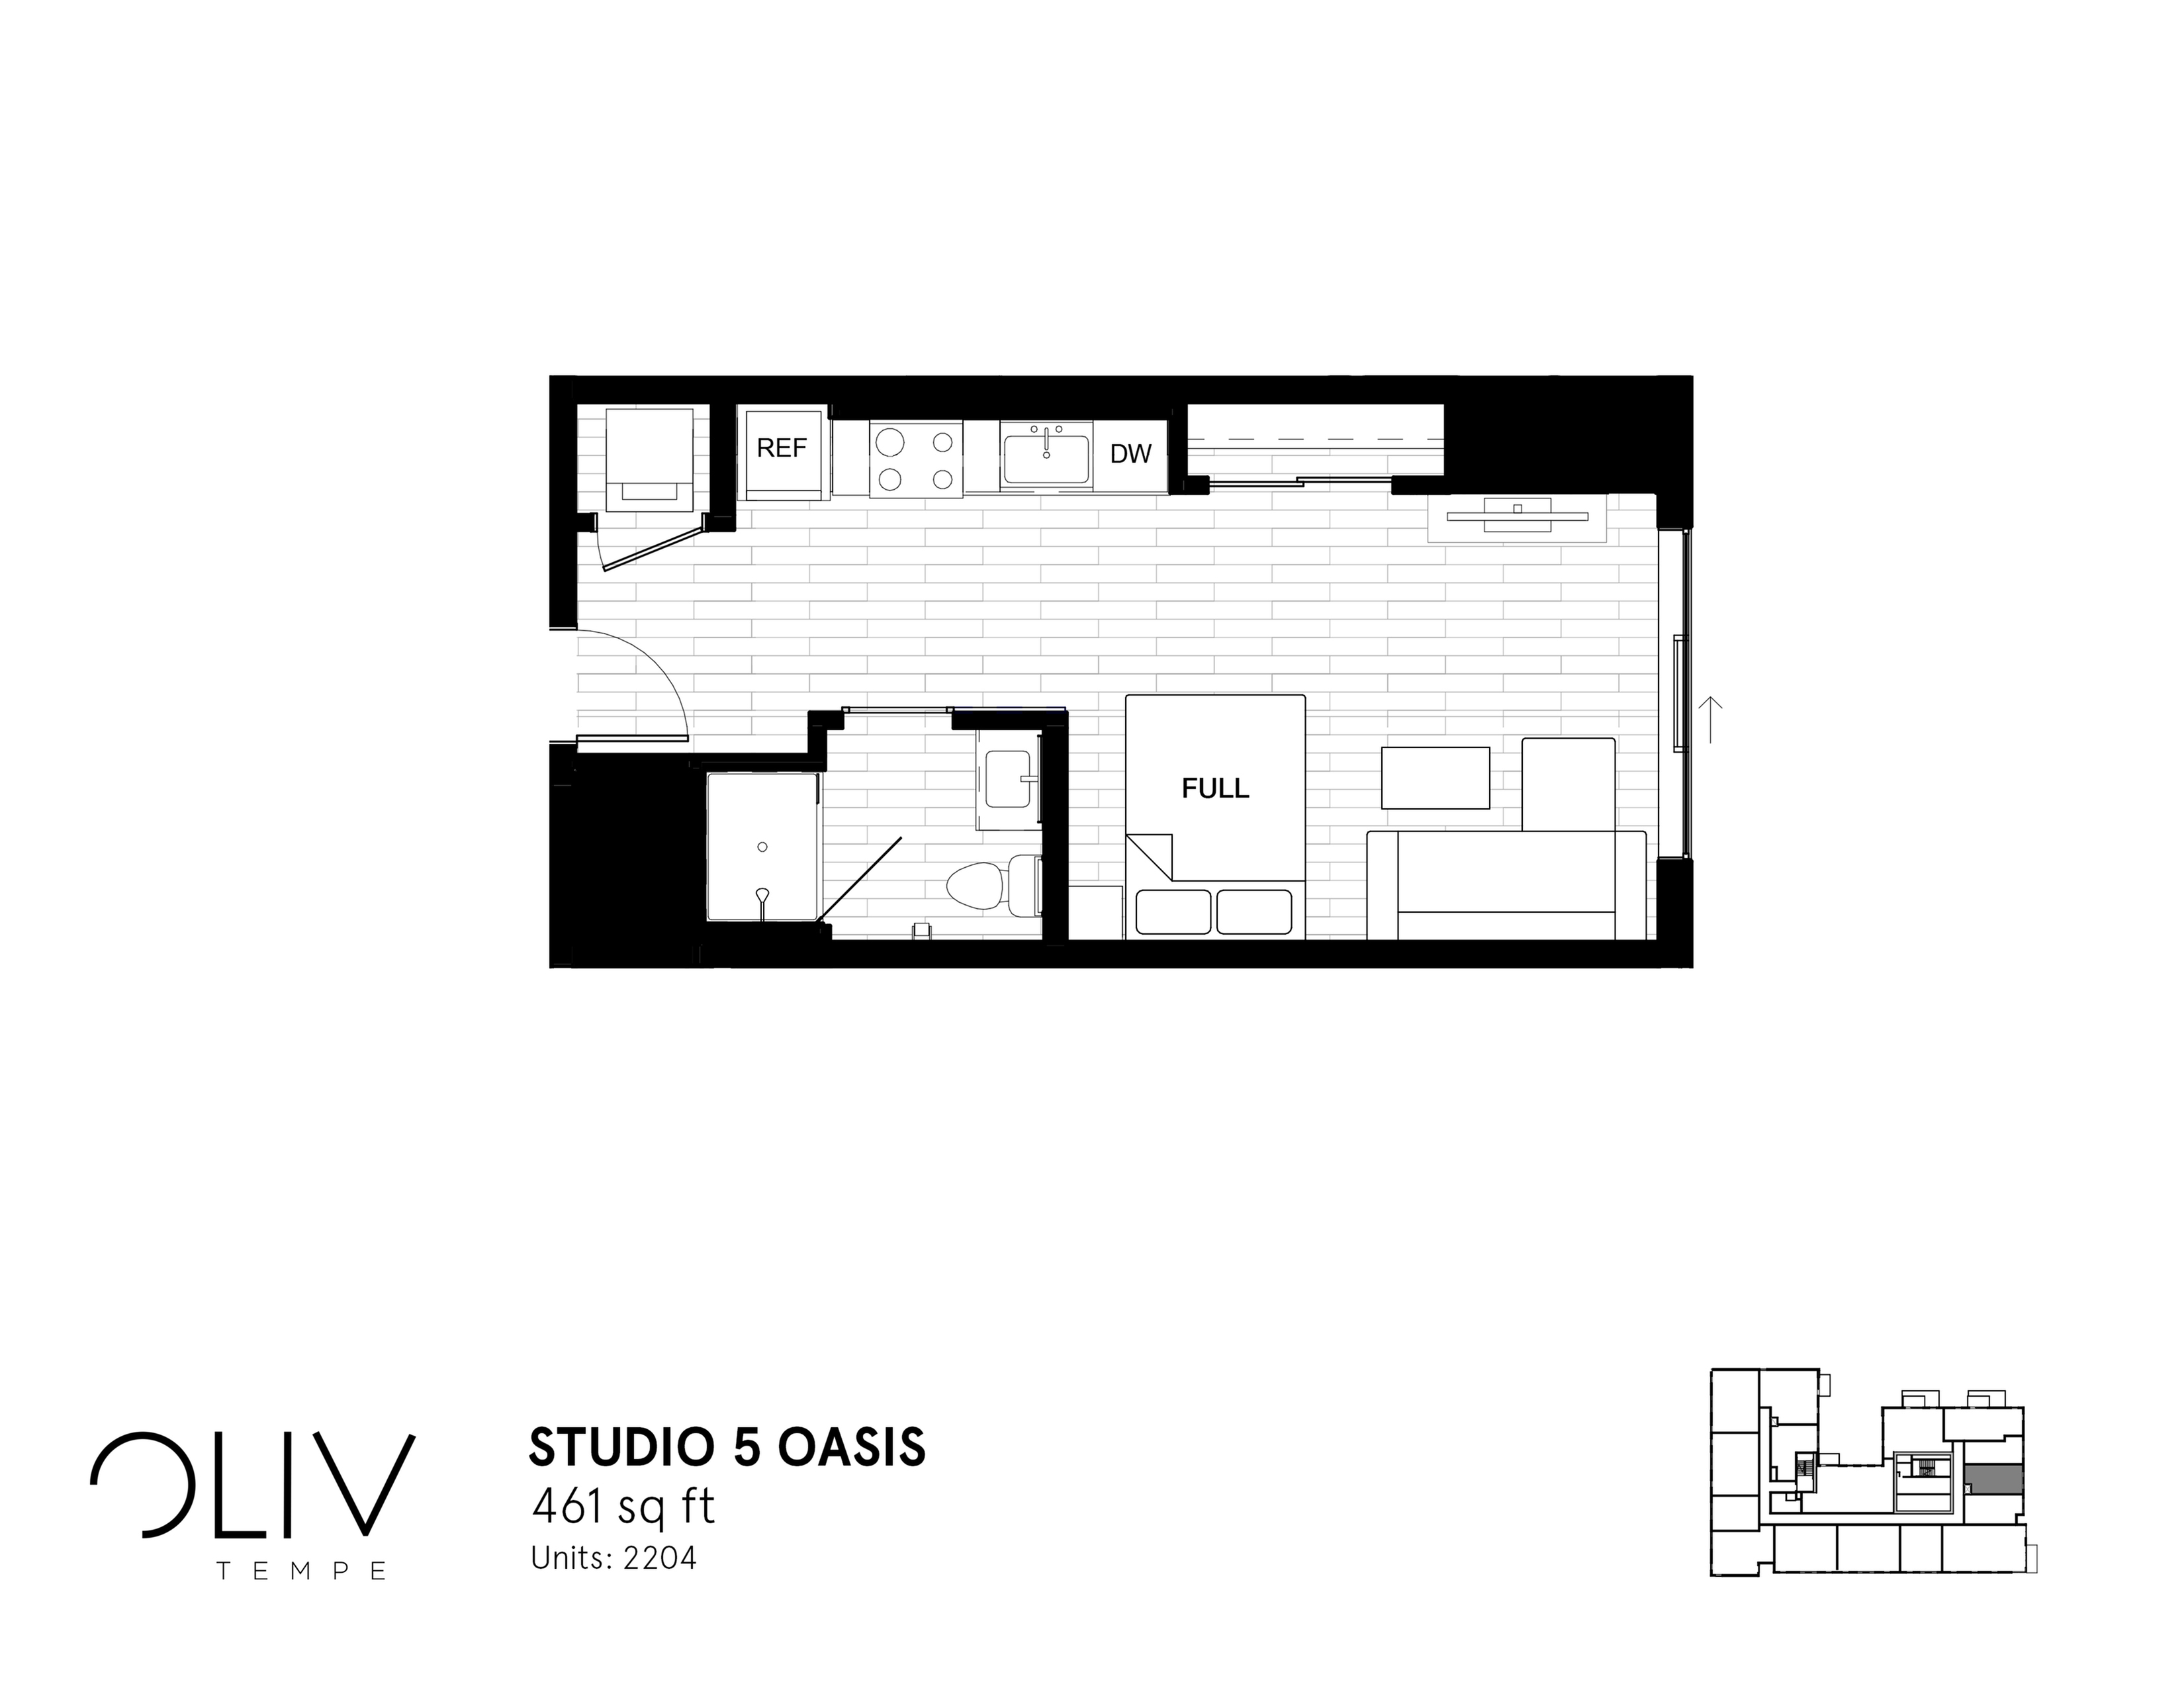 Studio 5 Oasis